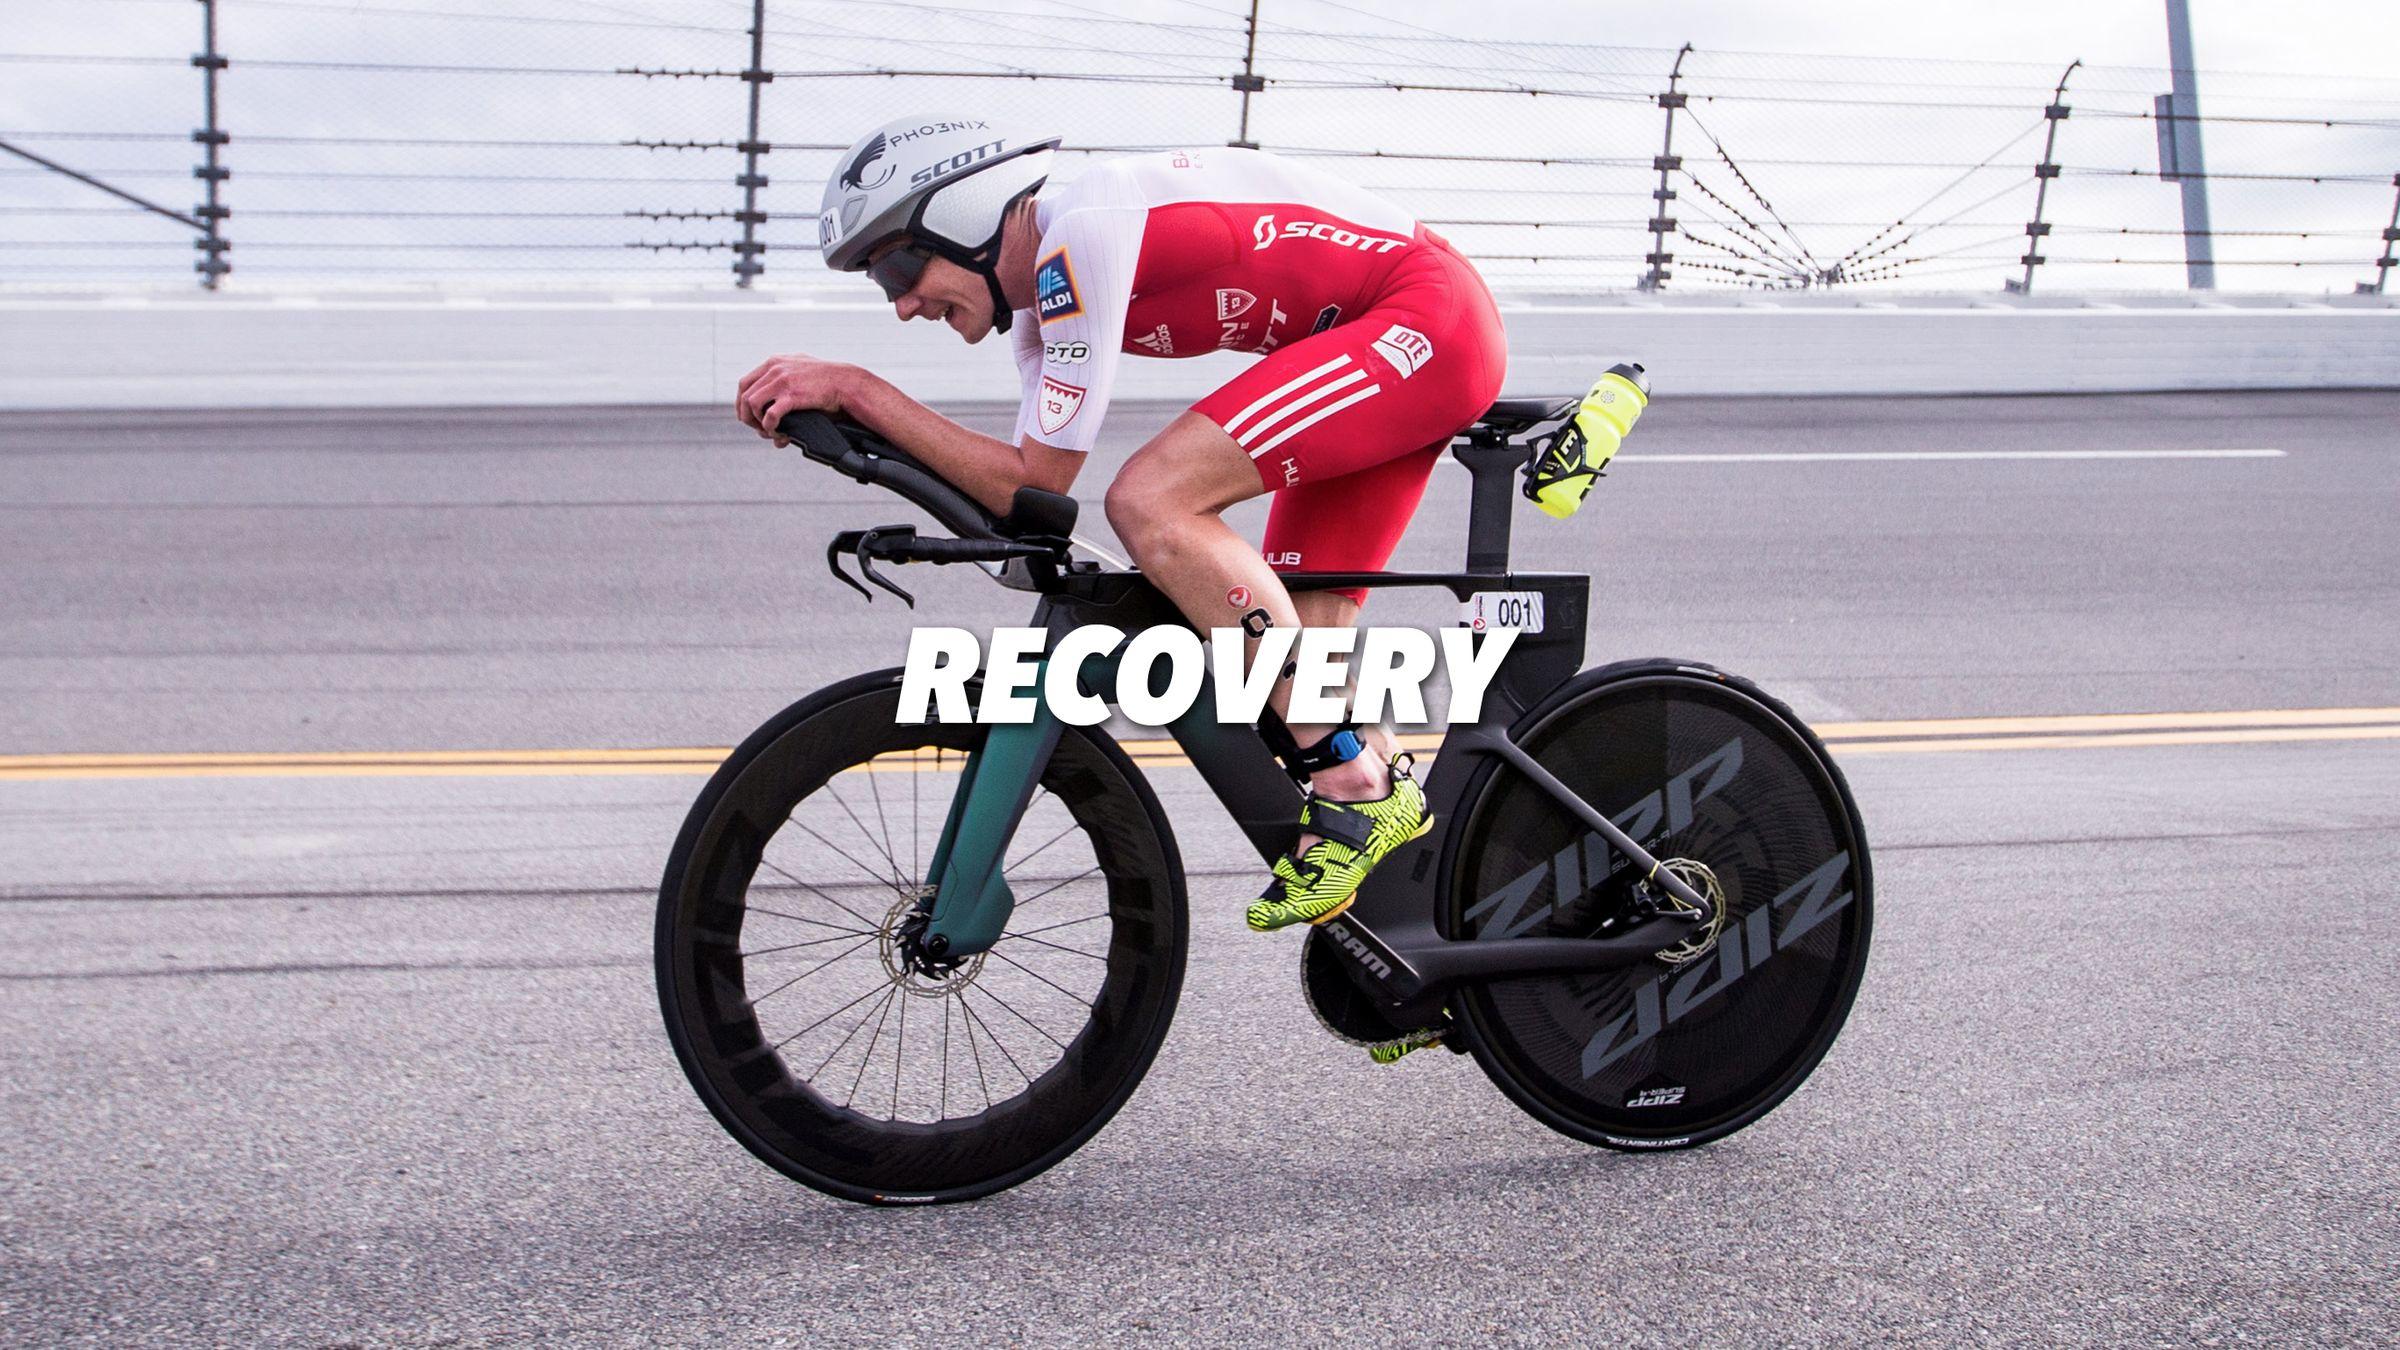 Injury Report: Trio tell their tales of Daytona